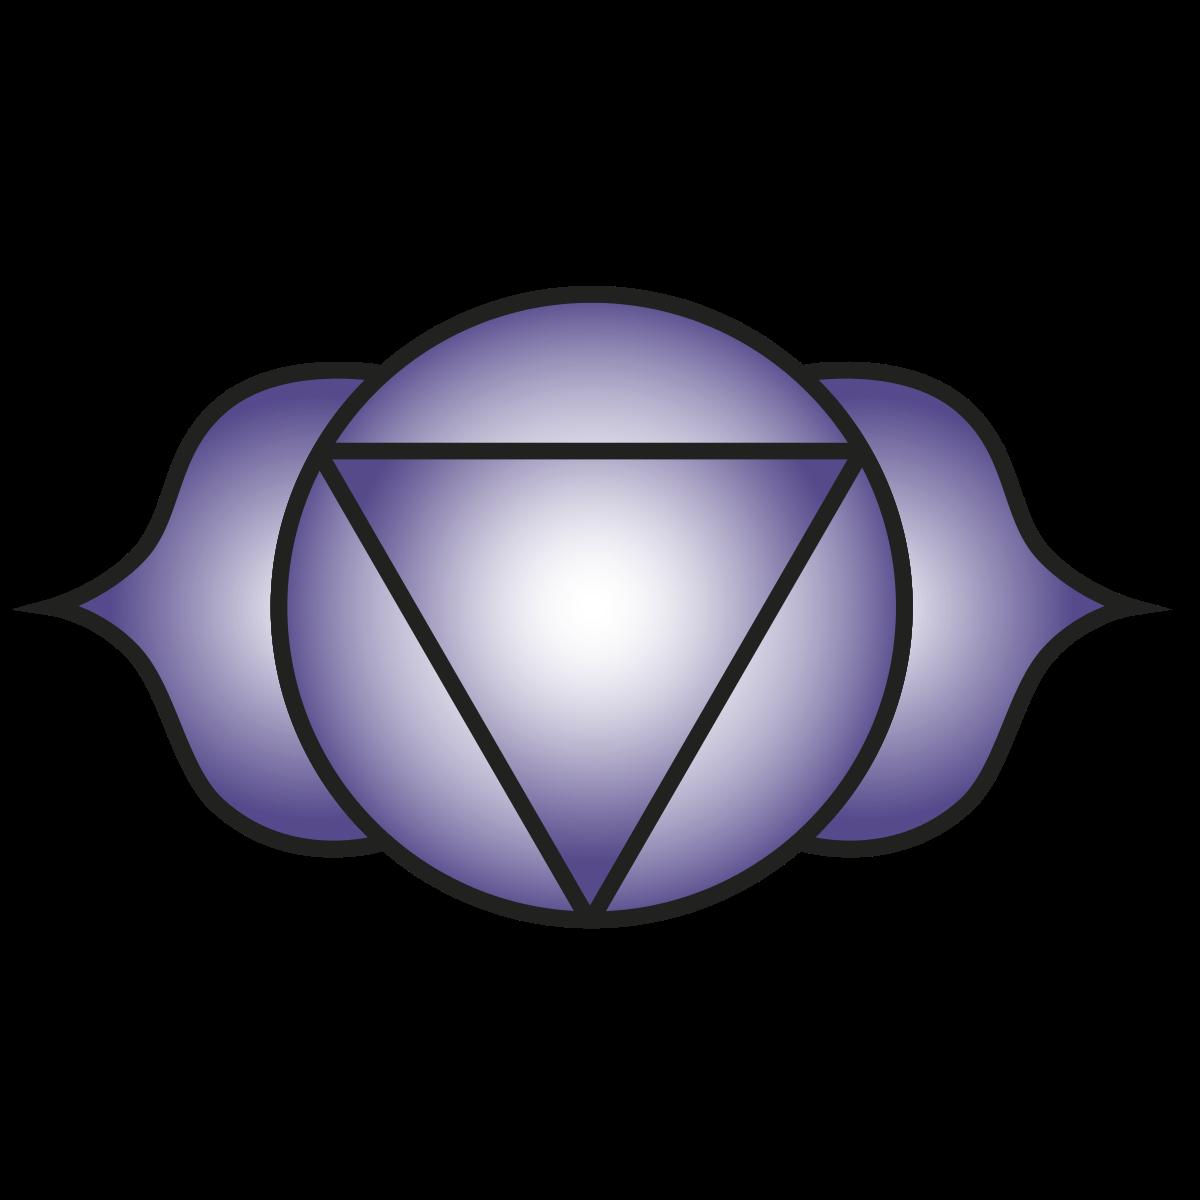 Vision clipart omniscient. Ajna wikipedia